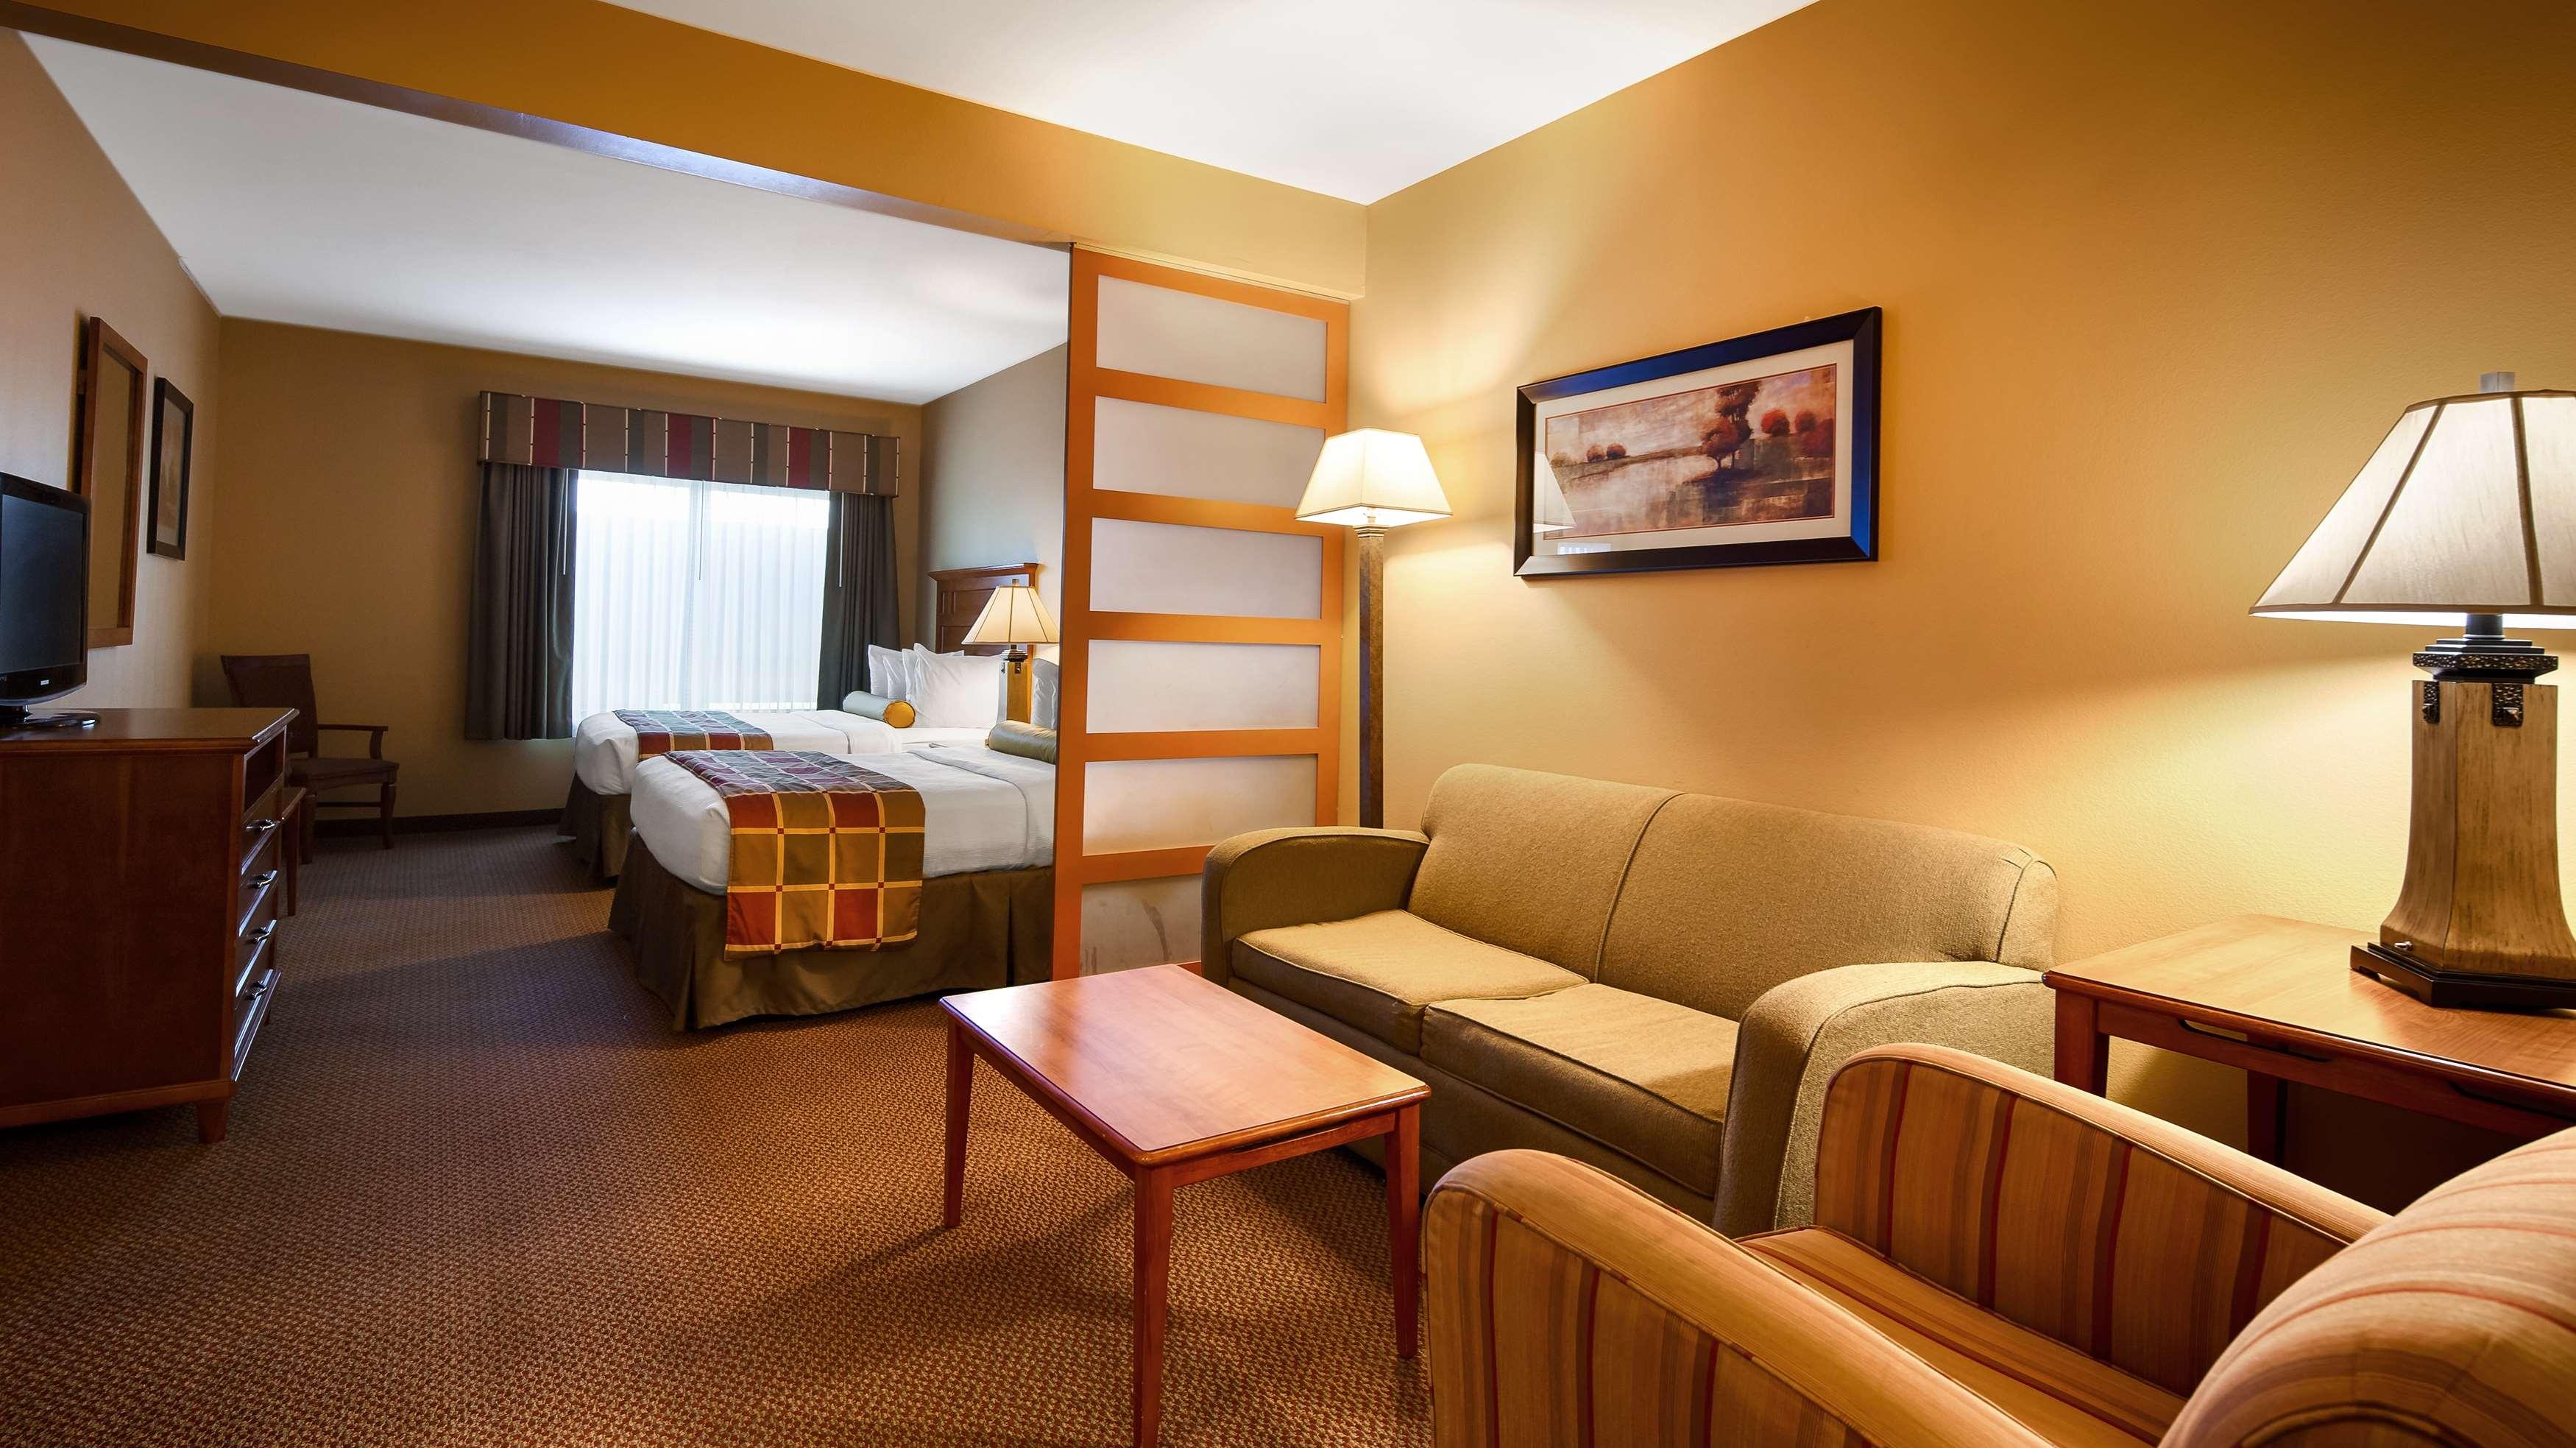 Best Western Plus University Park Inn & Suites image 8